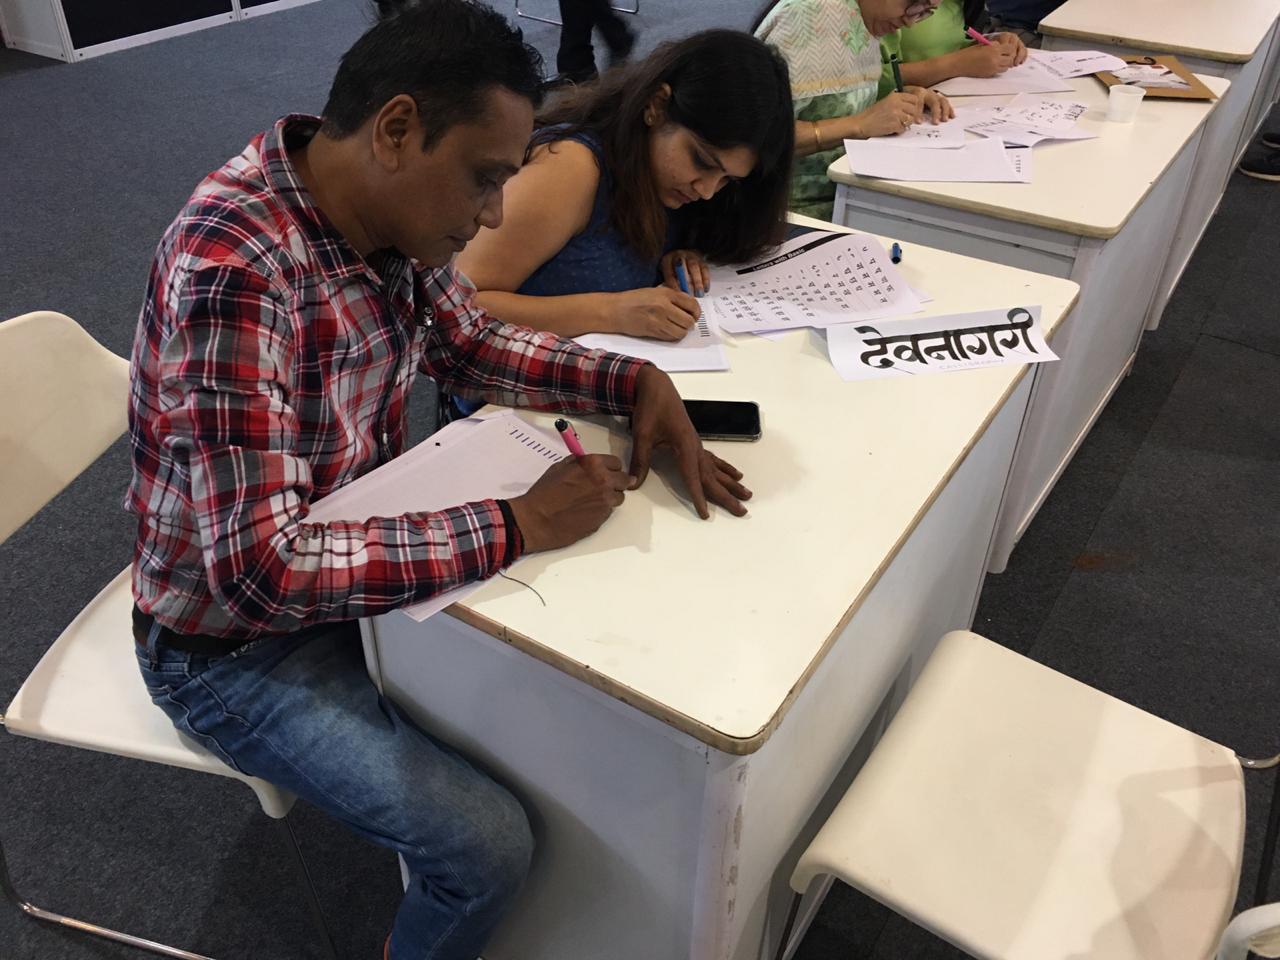 Gujrati Calligraphers Community